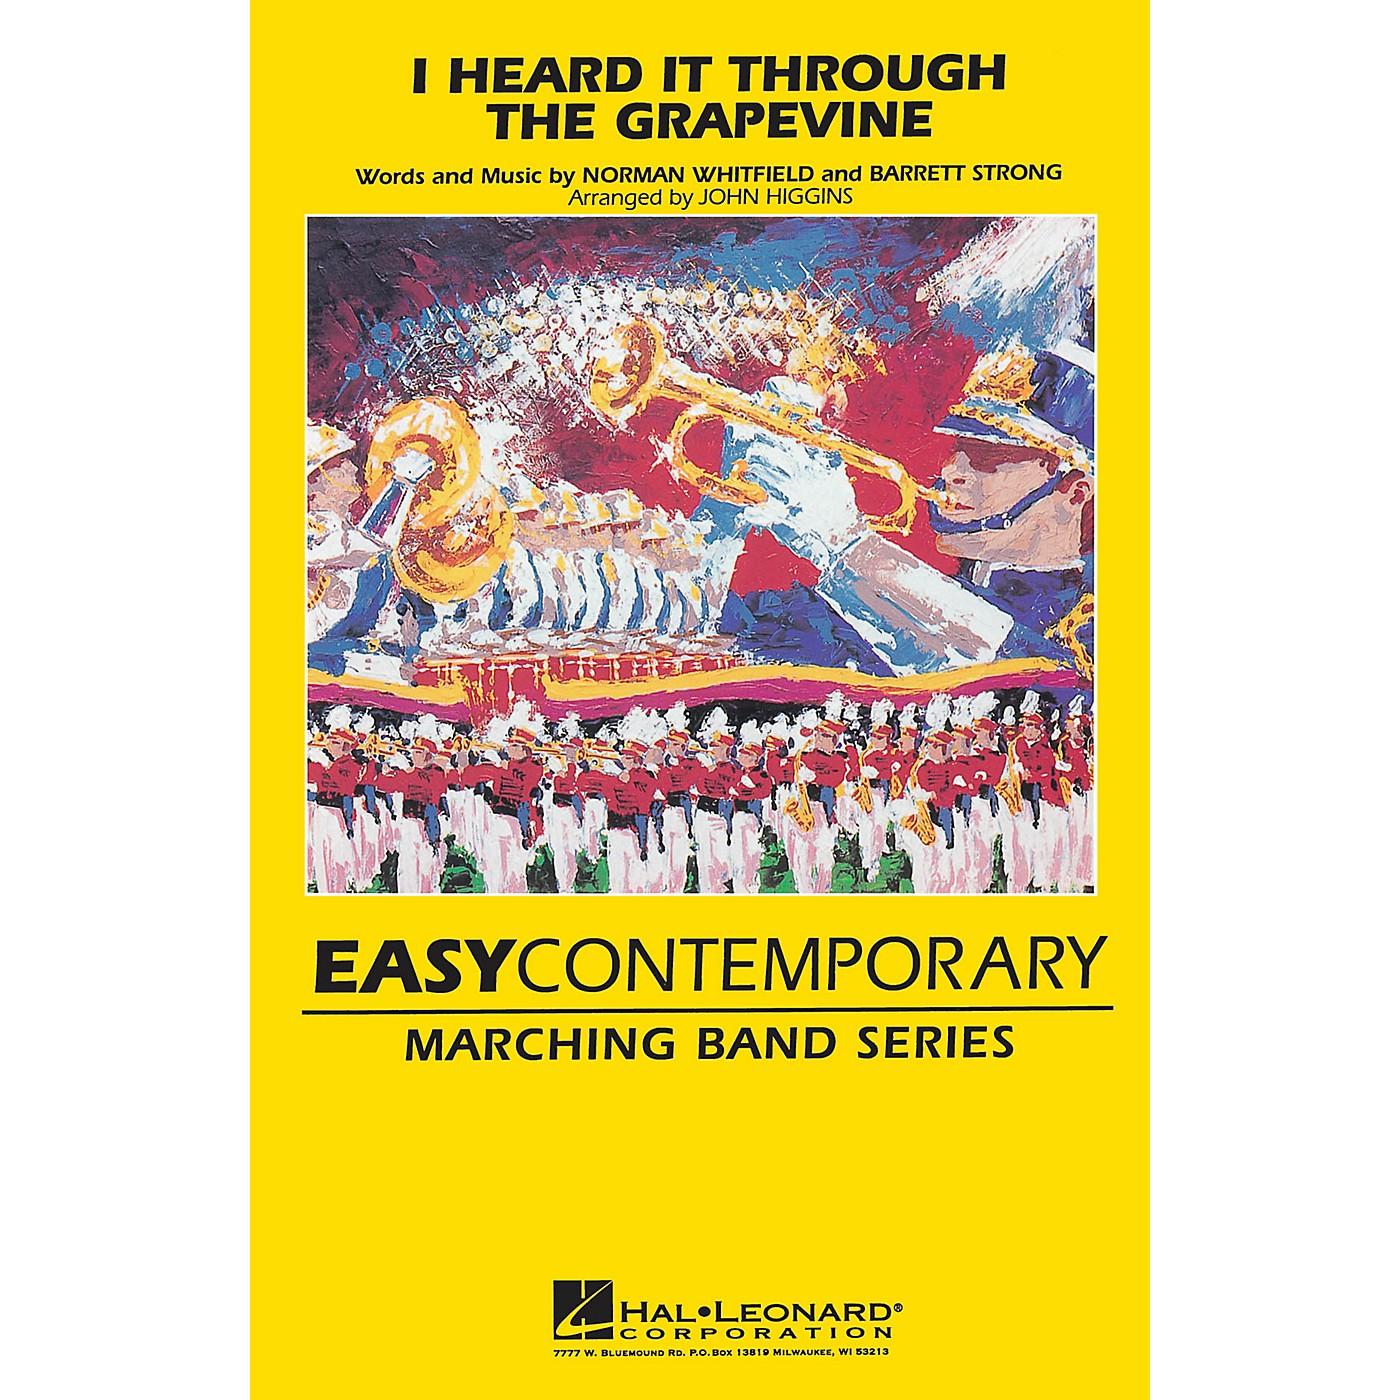 Hal Leonard I Heard It Through the Grapevine Marching Band Level 2 Arranged by John Higgins thumbnail